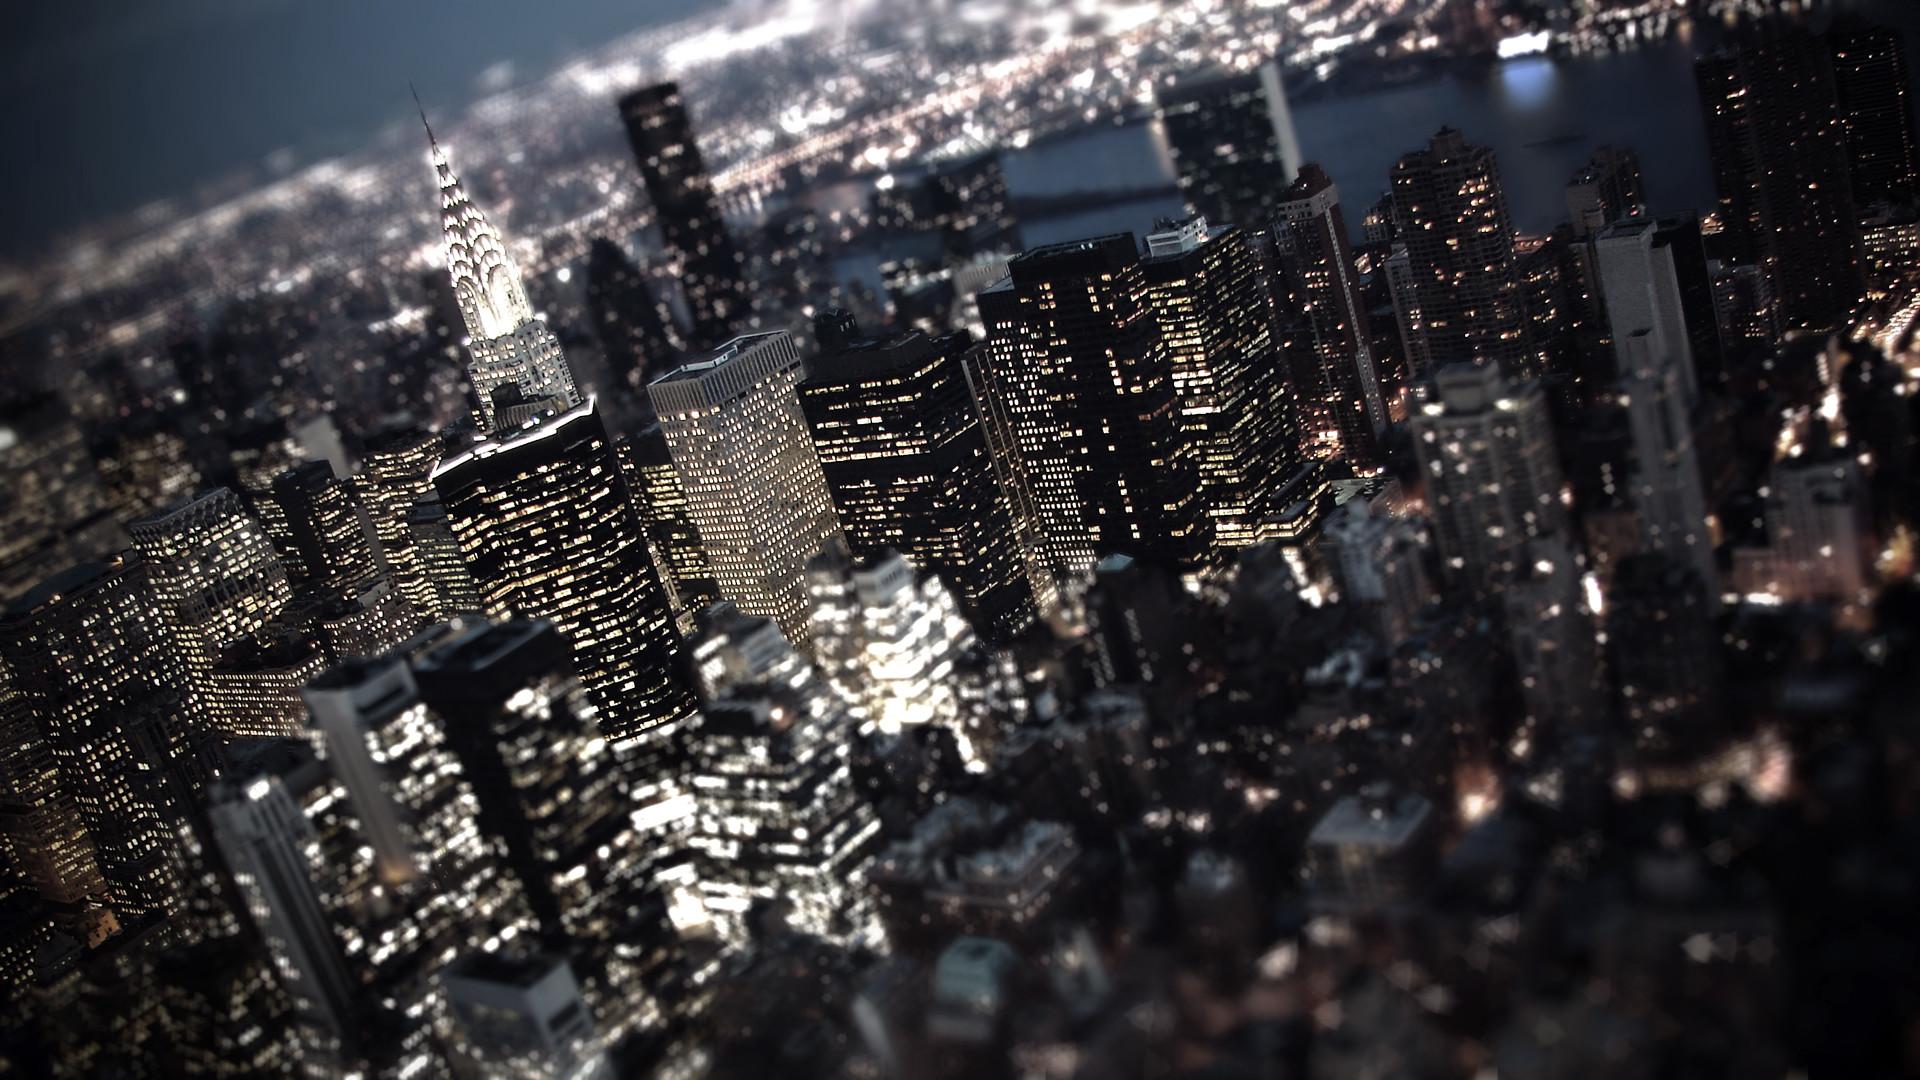 Night City Wallpaper HD 3329